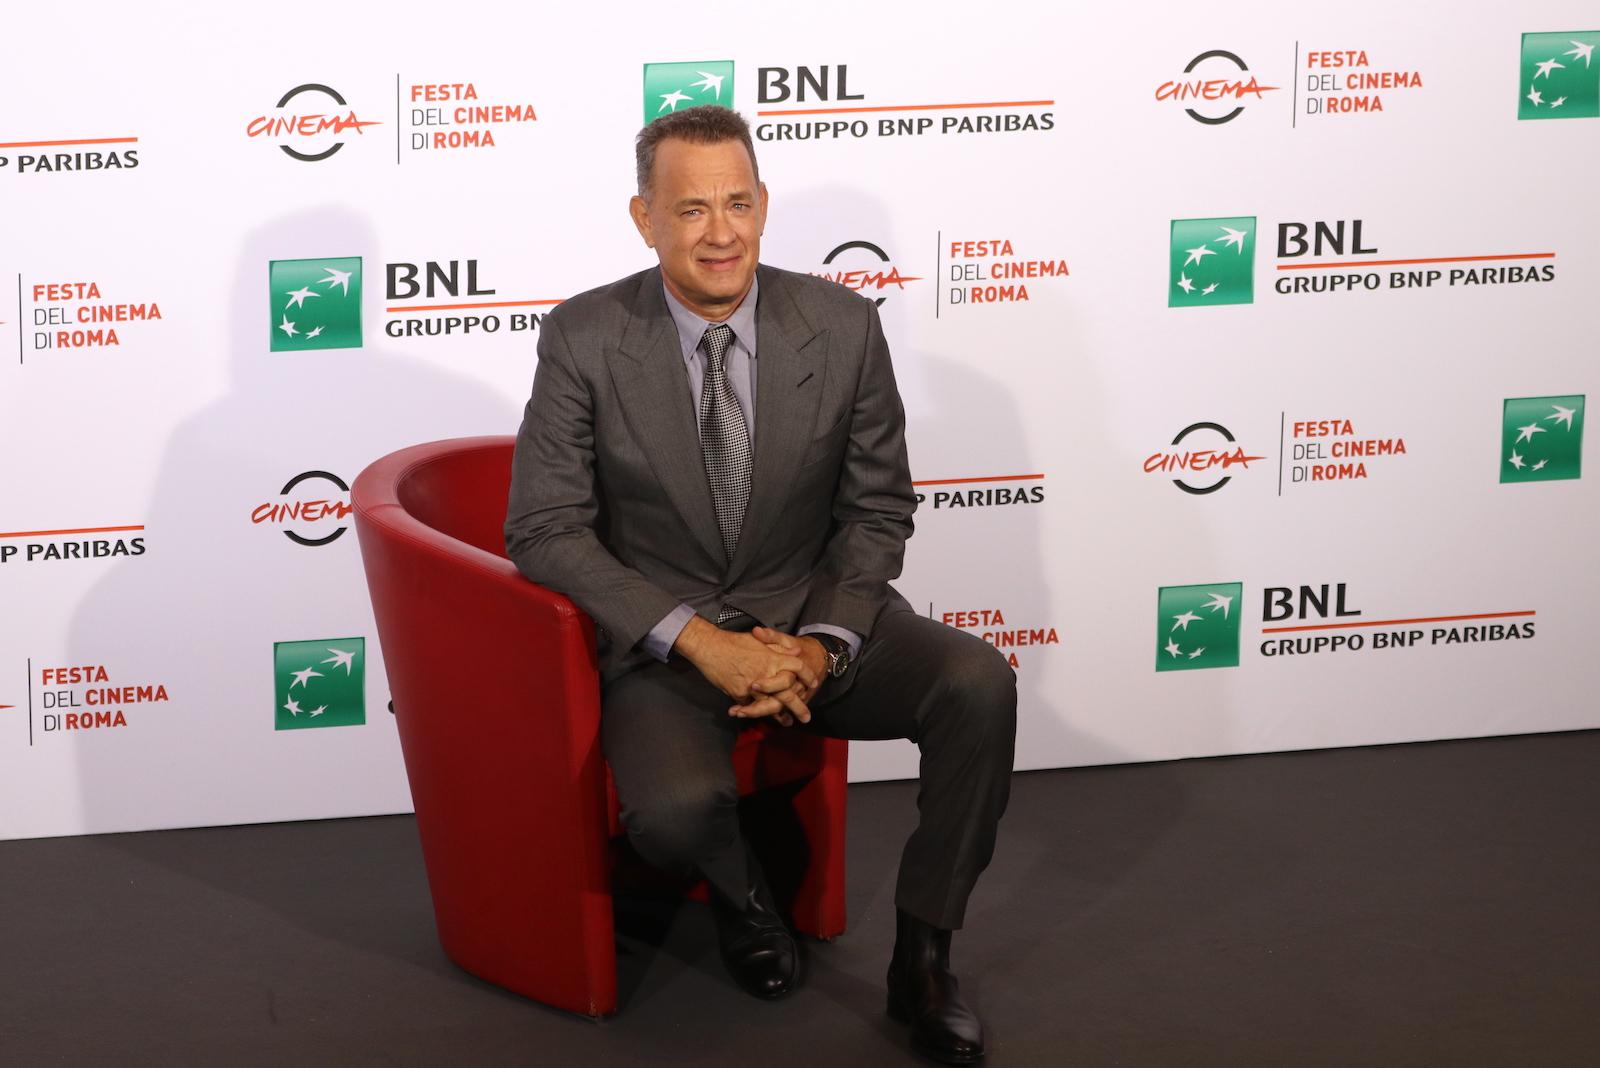 Roma 2016: Tom Hanks in posa al photocall